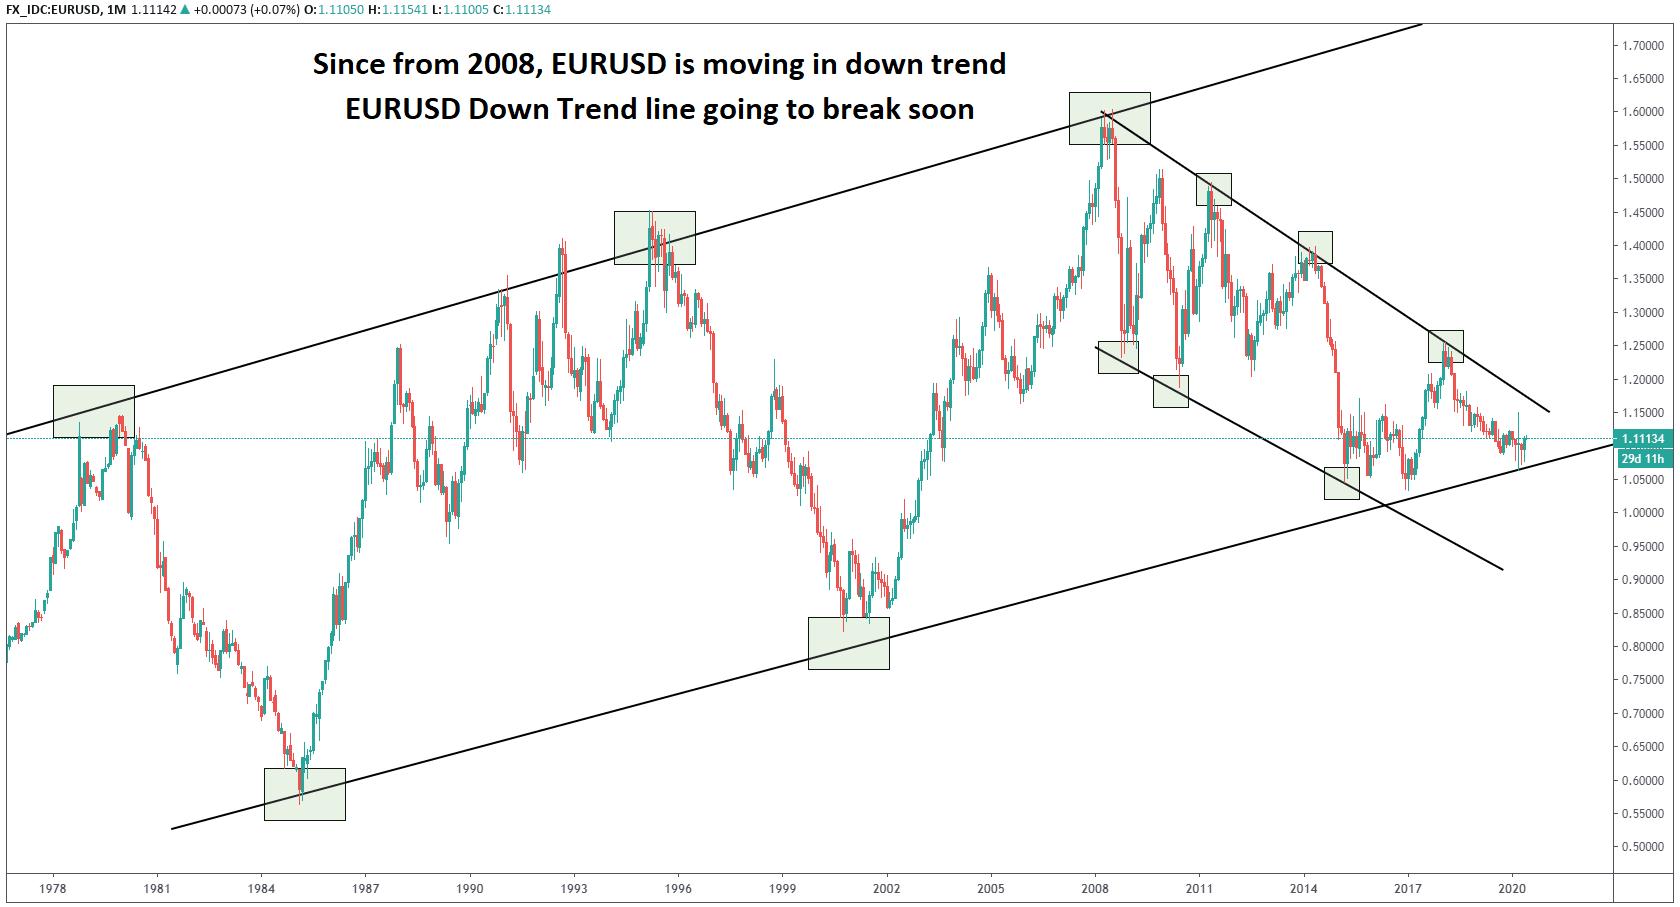 EURUSD down trend going to break soon